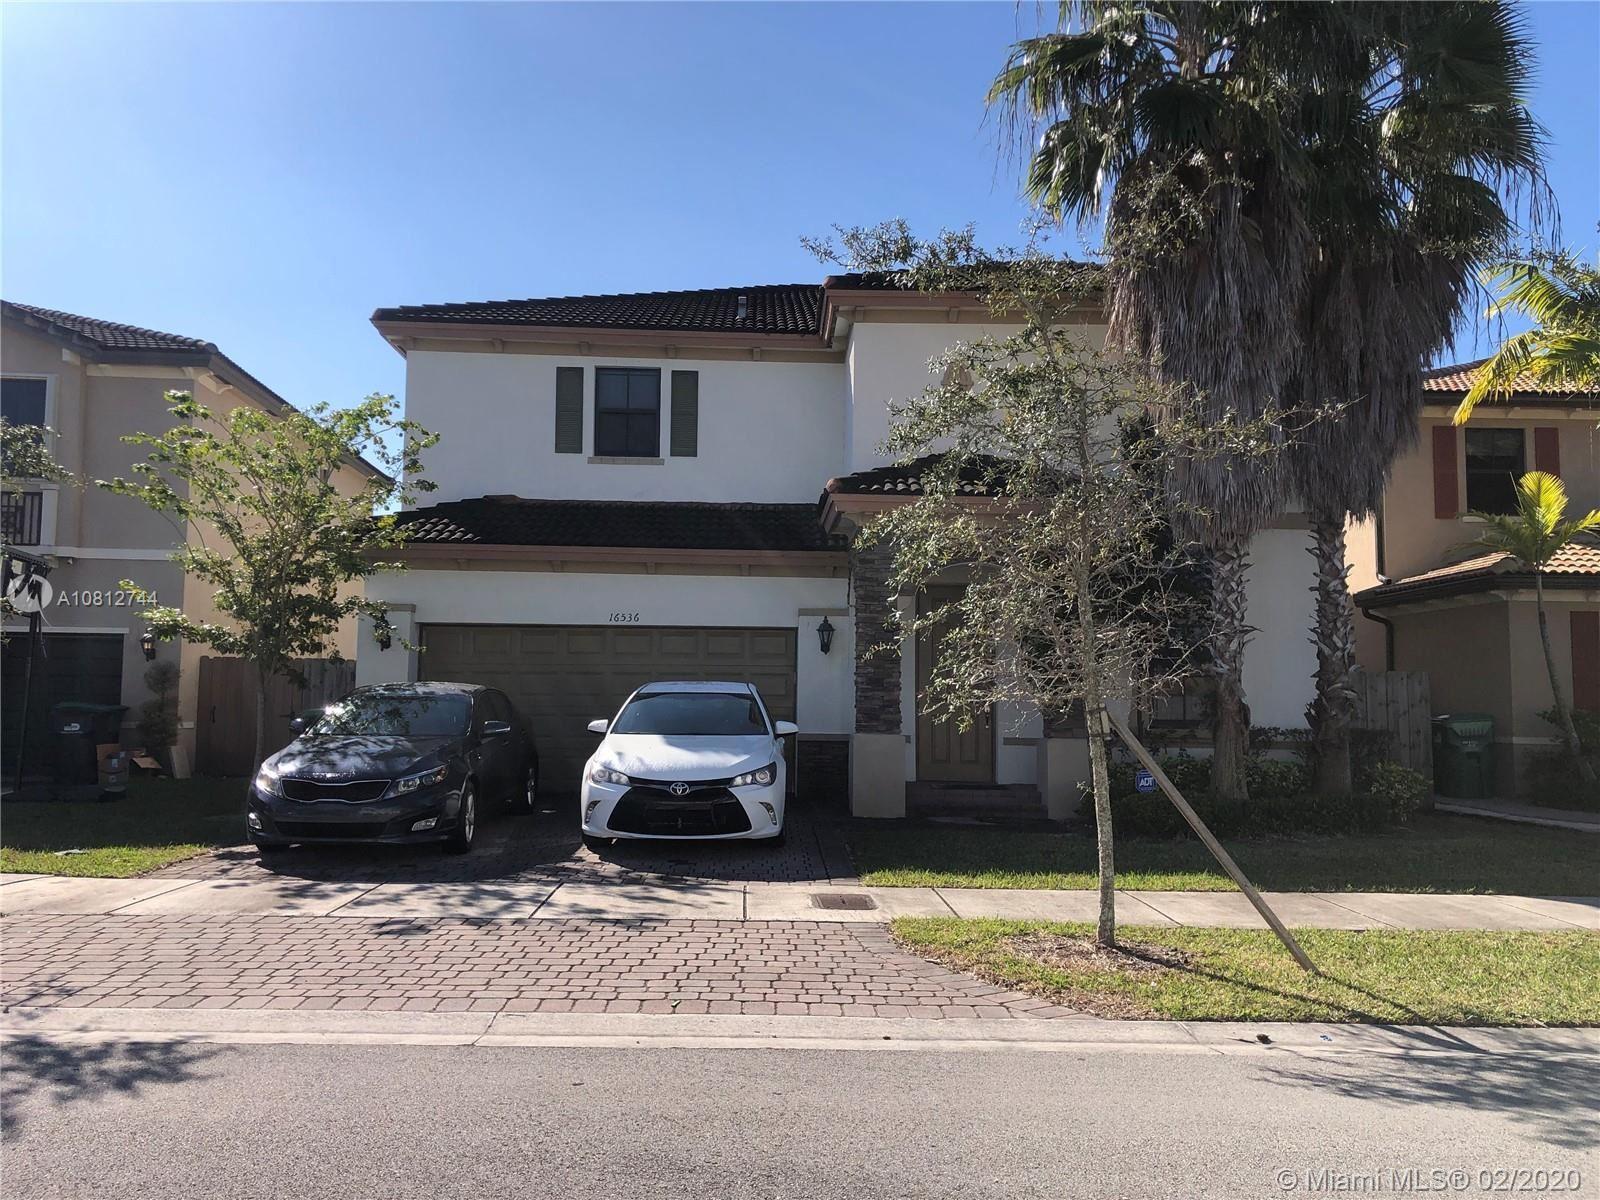 Photo of 16536 SW 43rd Ln, Miami, FL 33185 (MLS # A10812744)